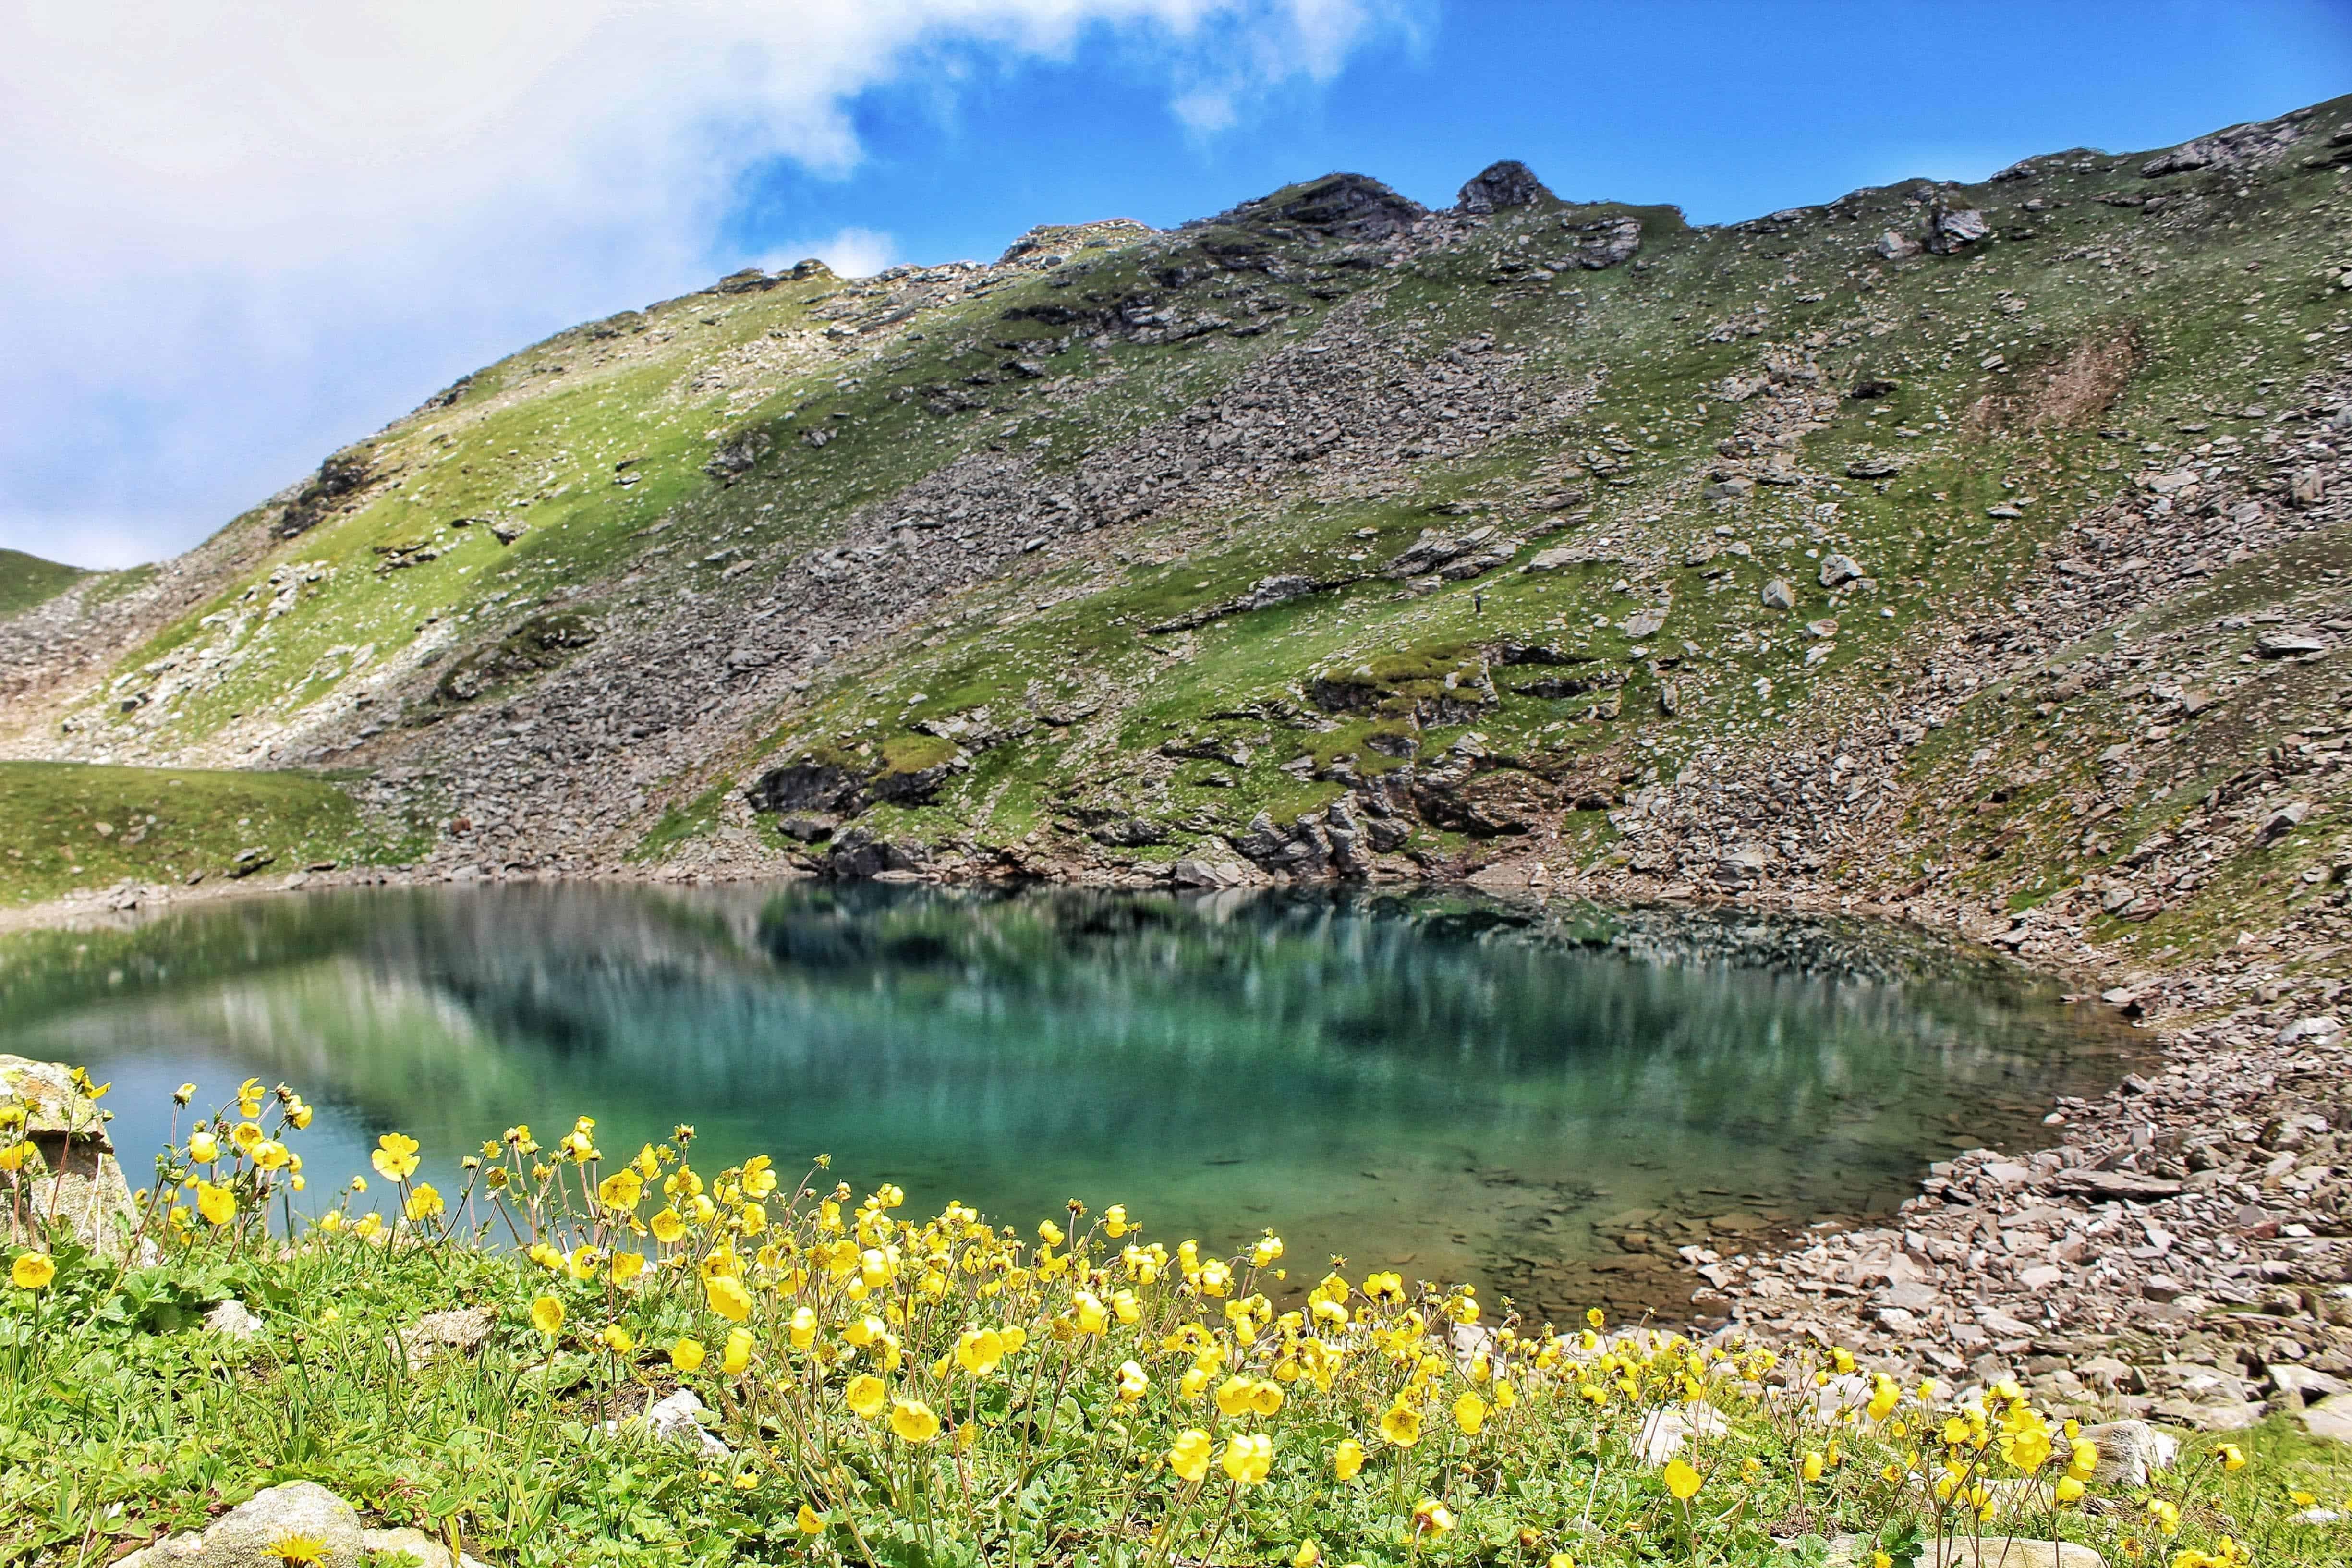 Yellow flowers along Bhrigu Lake